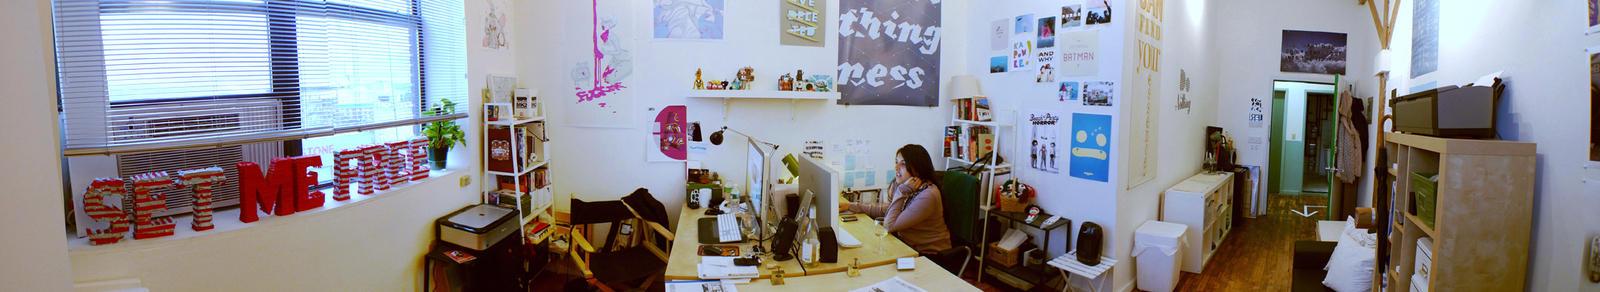 Open Studio Panorama 01